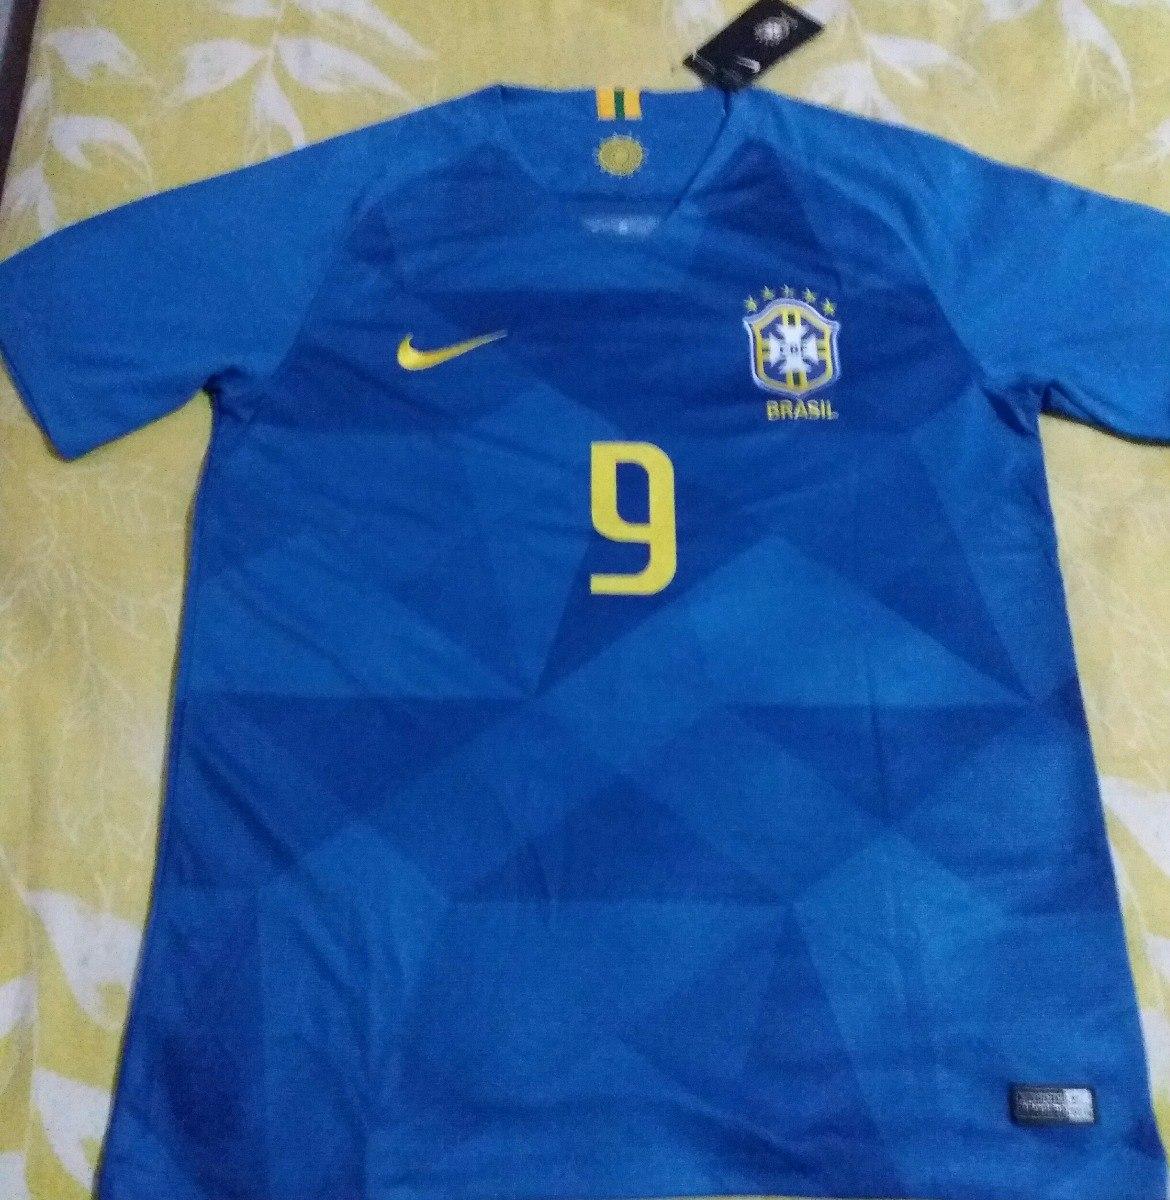 7448774887662 camisa seleção brasil ii 2018 nº 9 g. jesus - torcedor nike. Carregando  zoom.